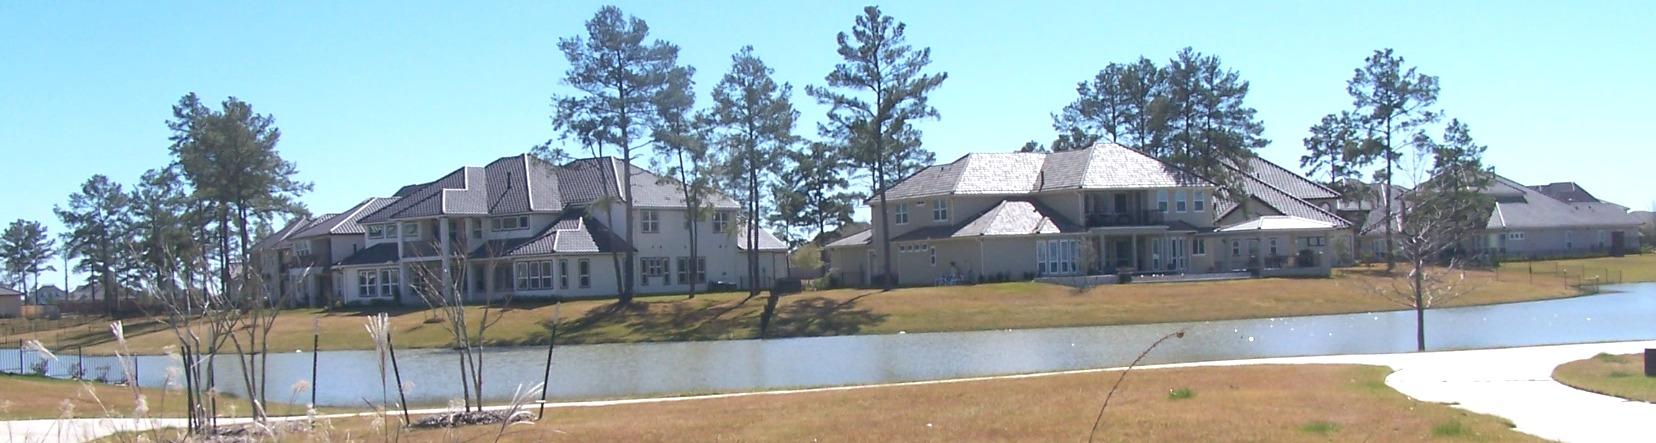 westlake houses 2